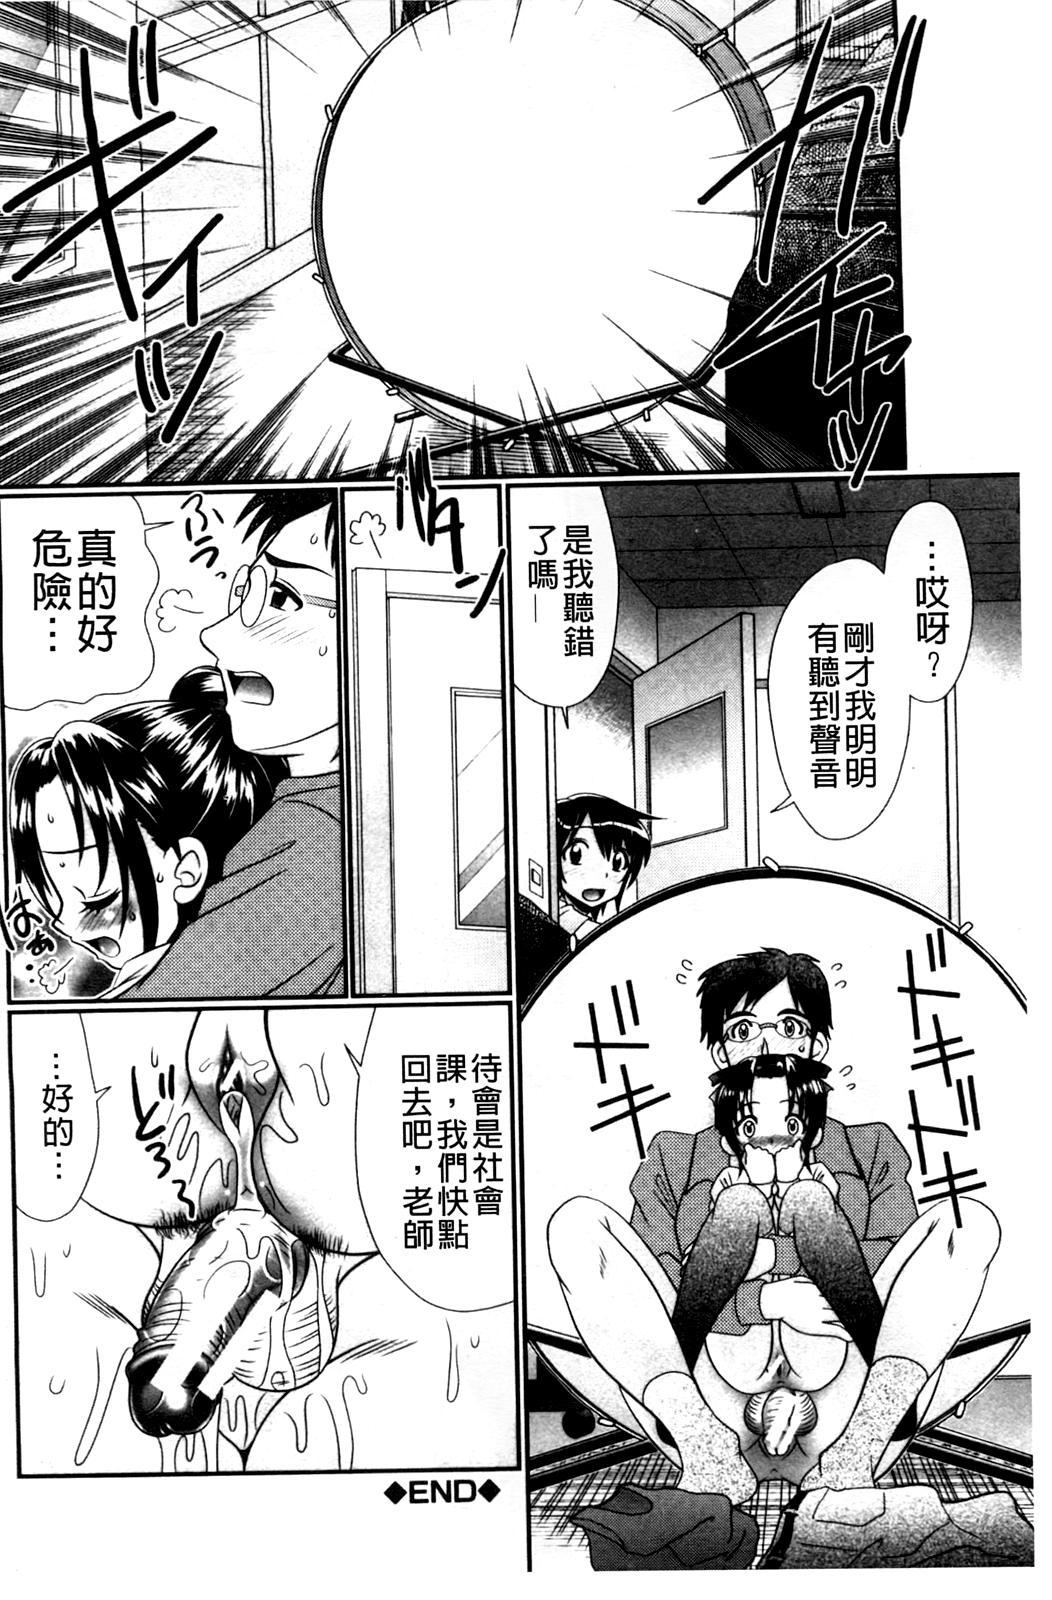 Higyaku Kyoushitsu 102